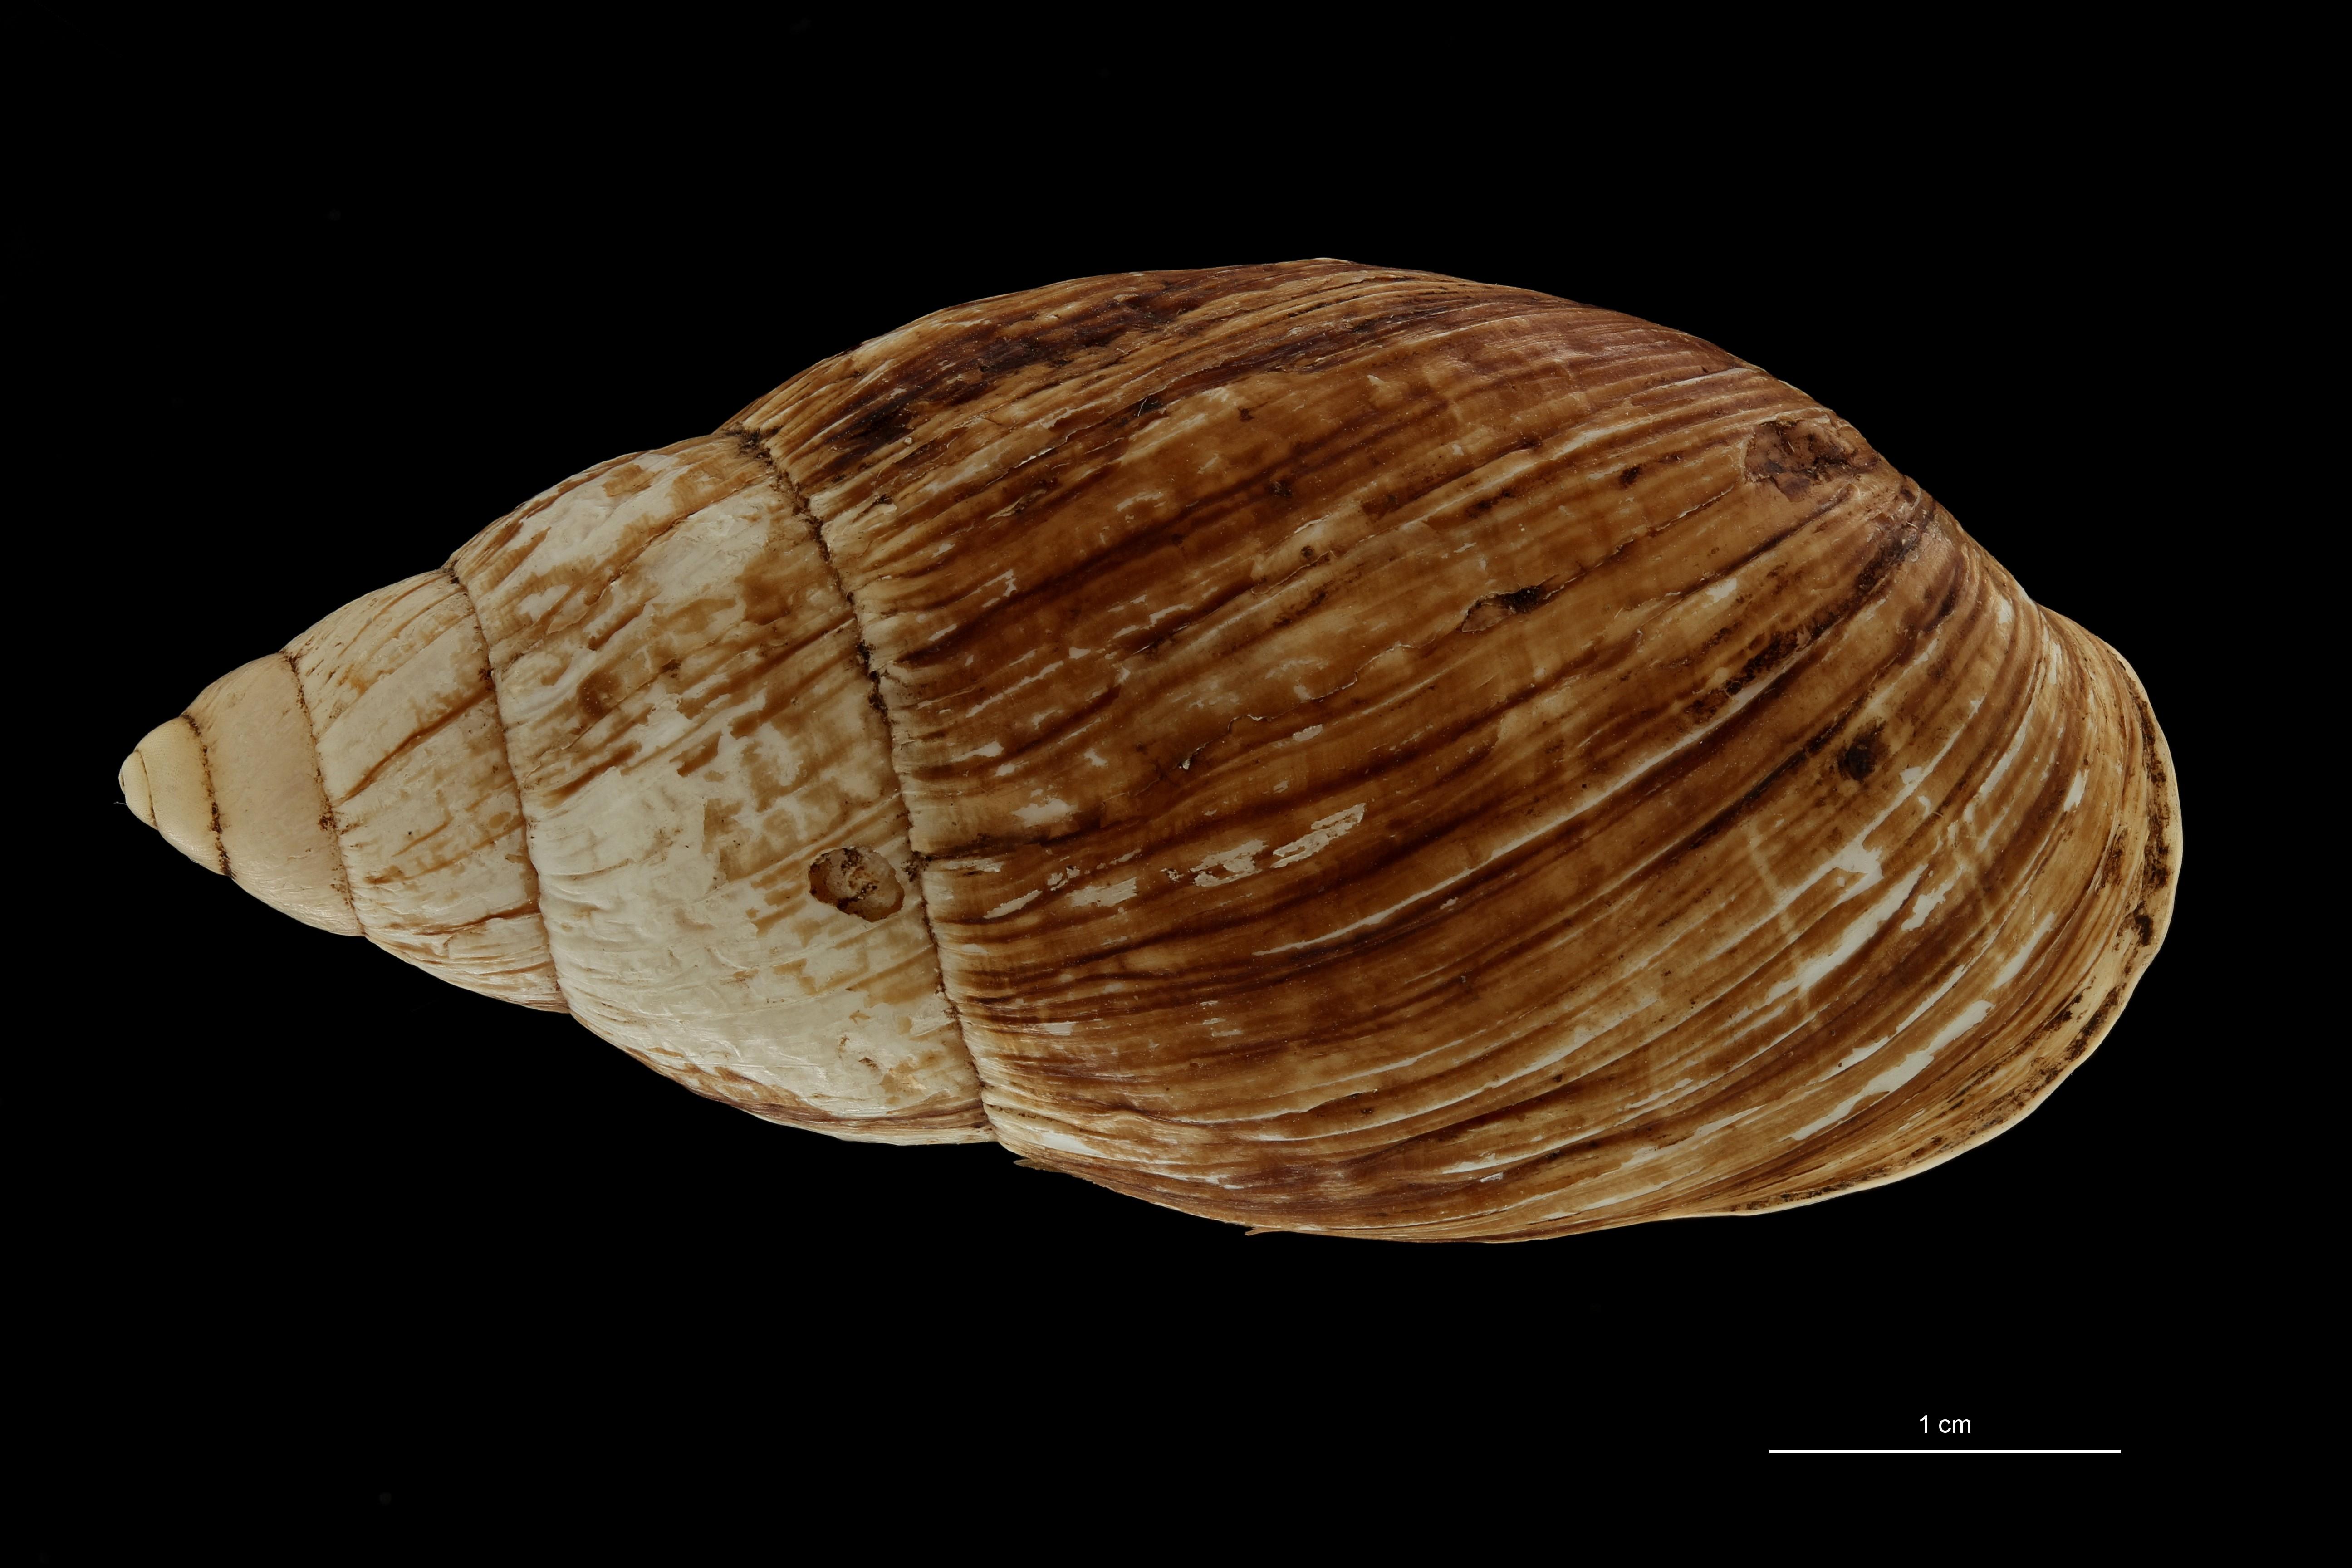 BE-RBINS-INV MT 703 Placostylus porphyrostomus var. nana Type D ZS PMax Scaled.jpg